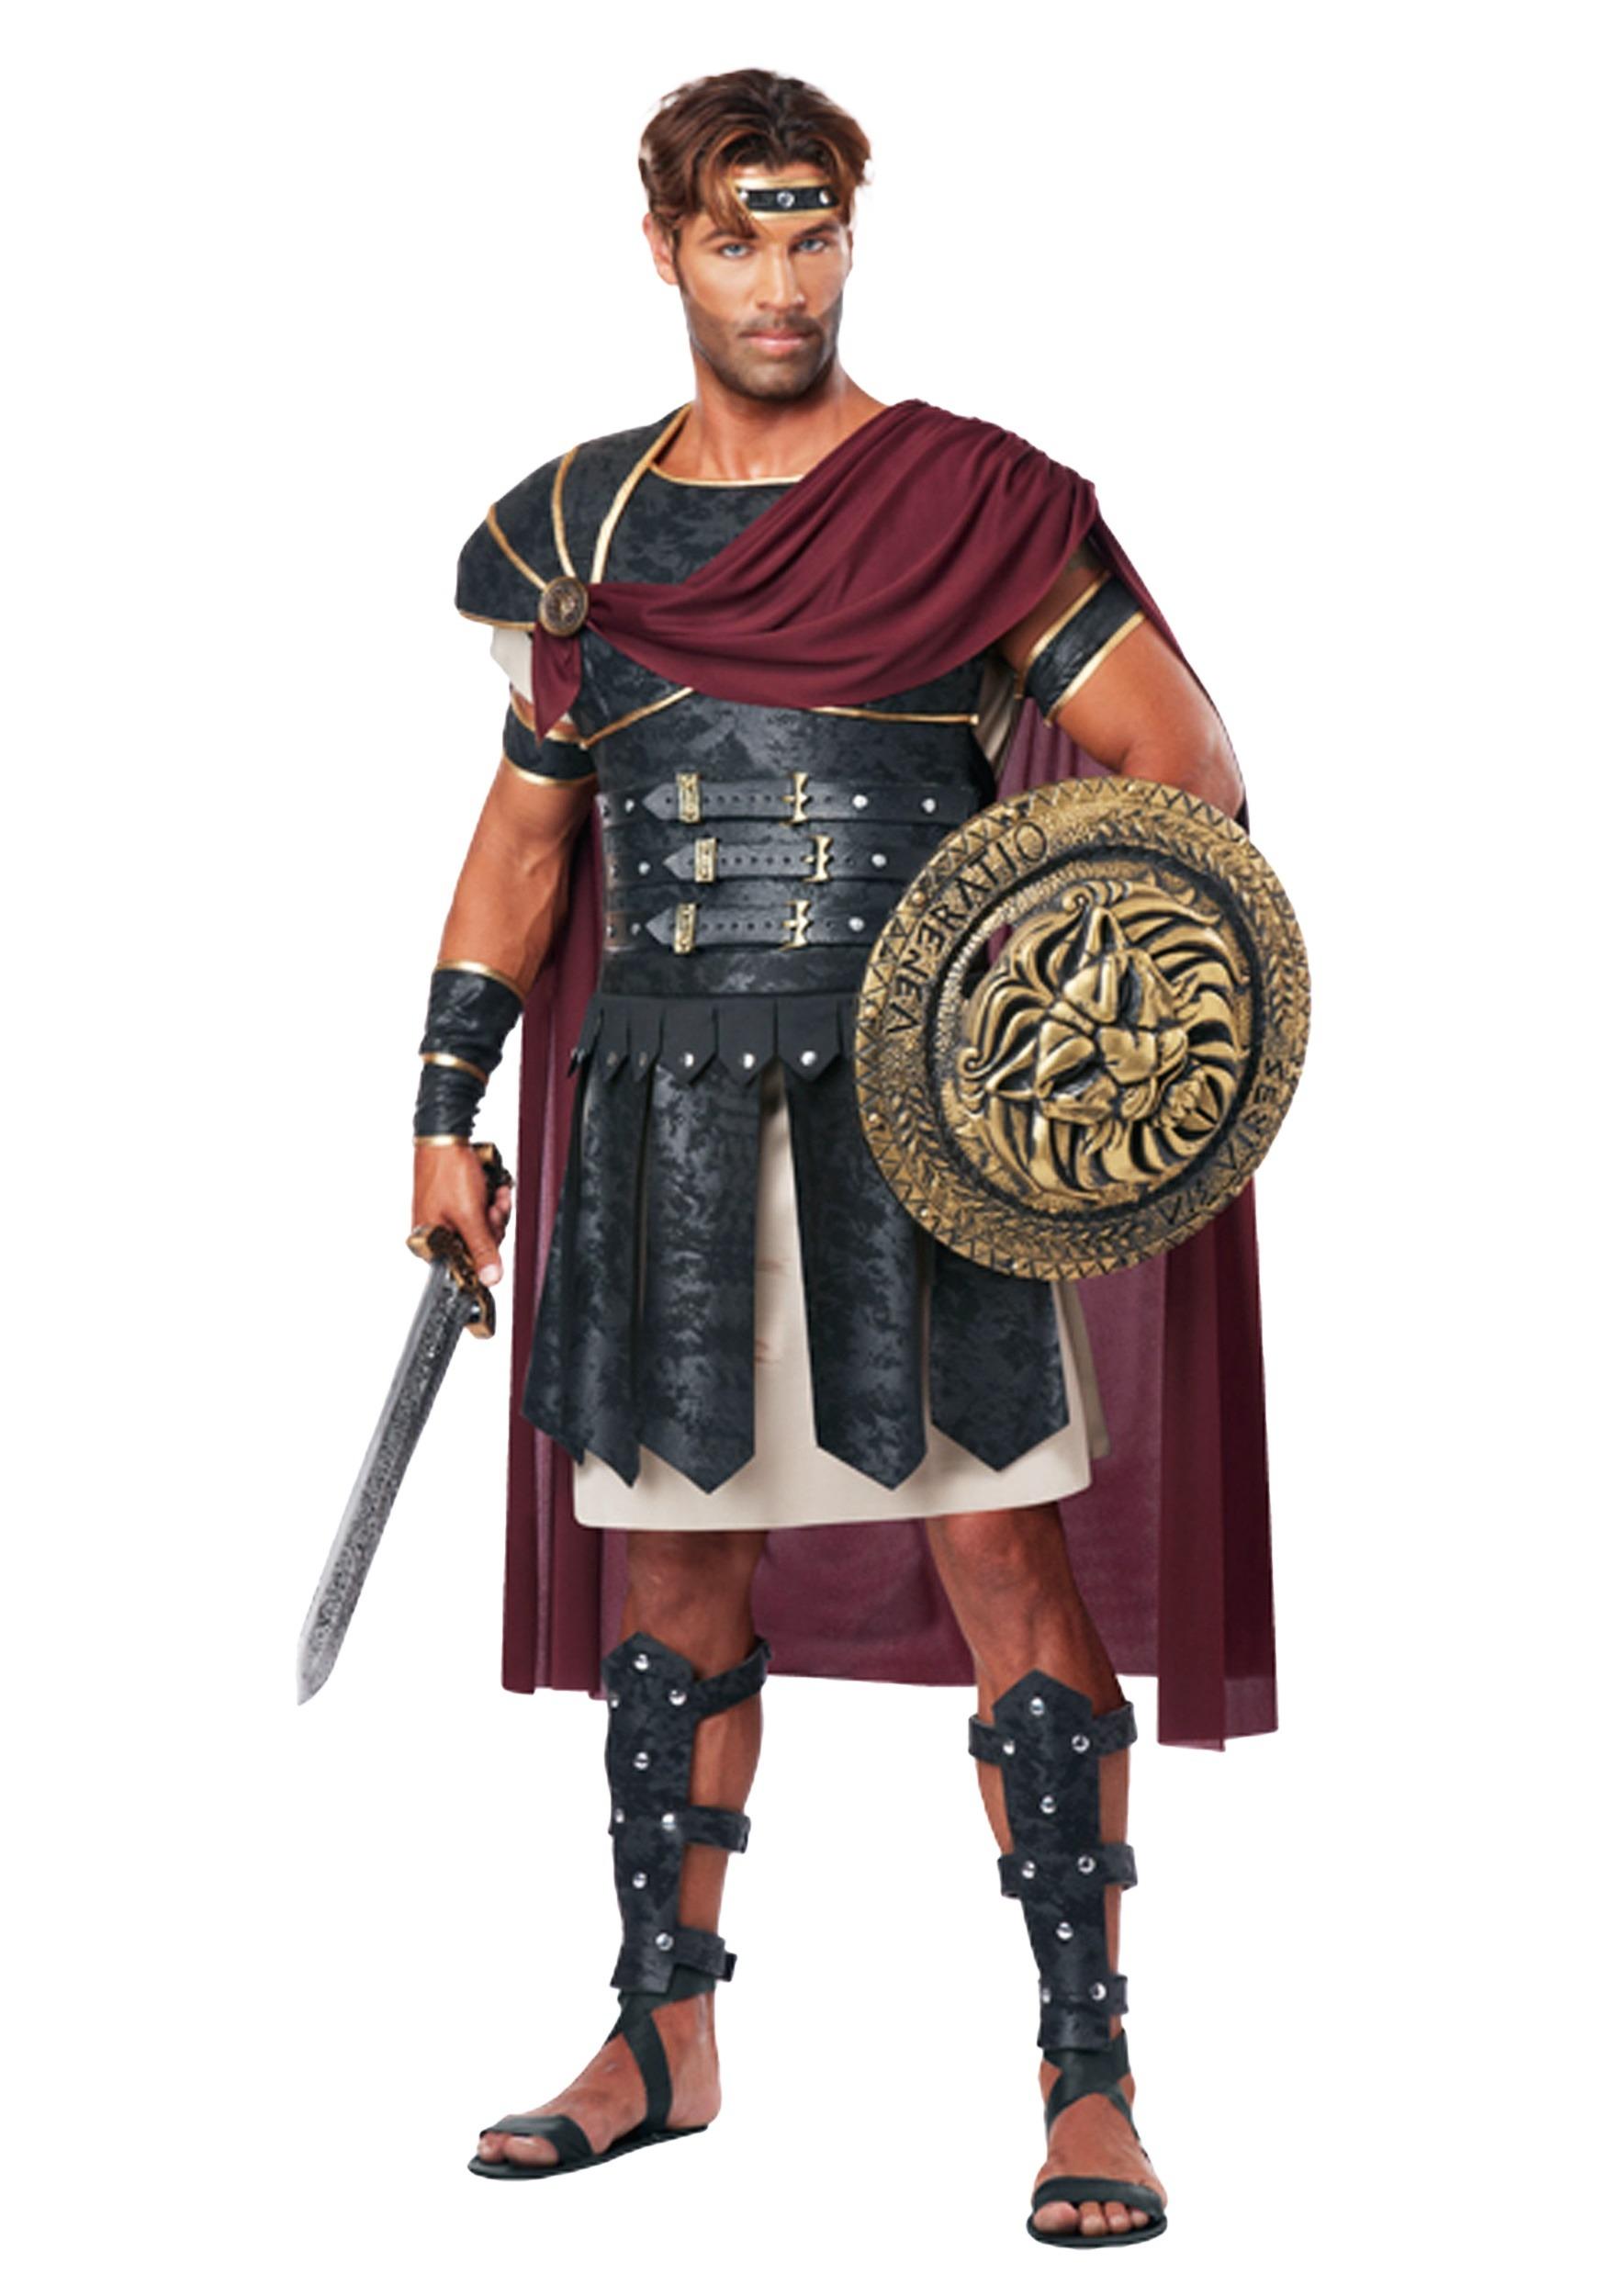 Gladitors